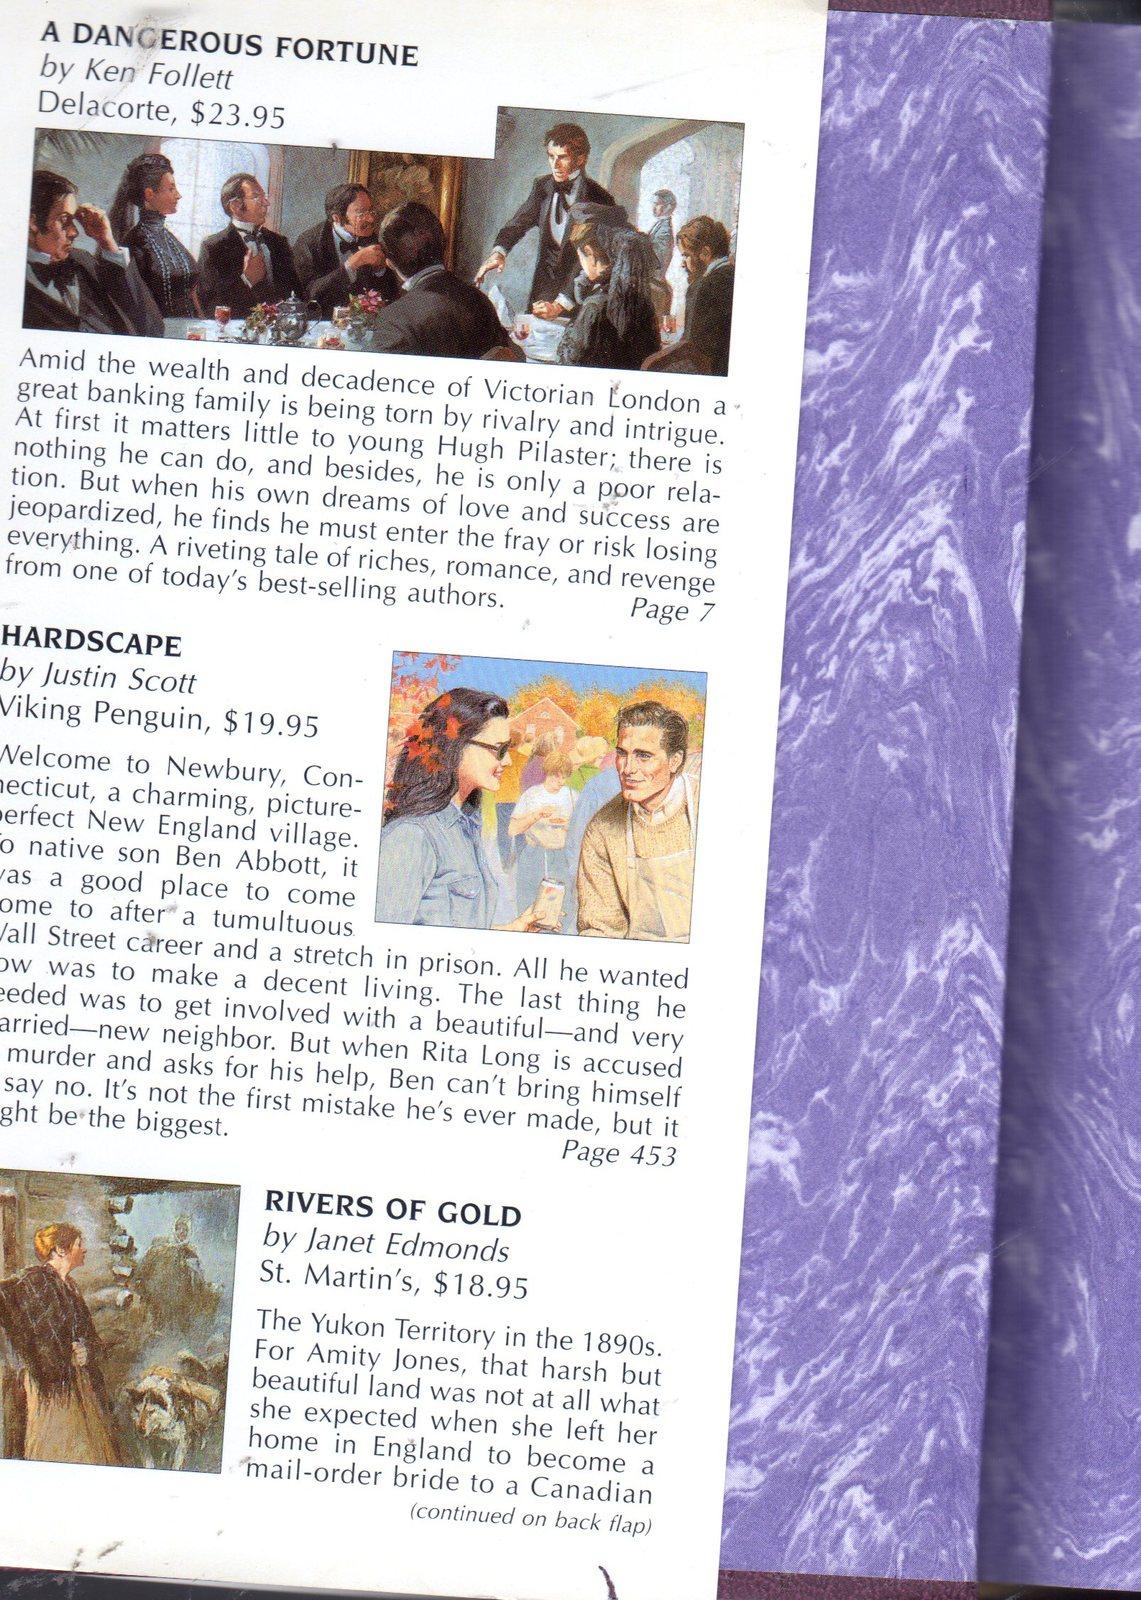 Reader's Digest Condensed Books Volume 3 - 1994 image 3